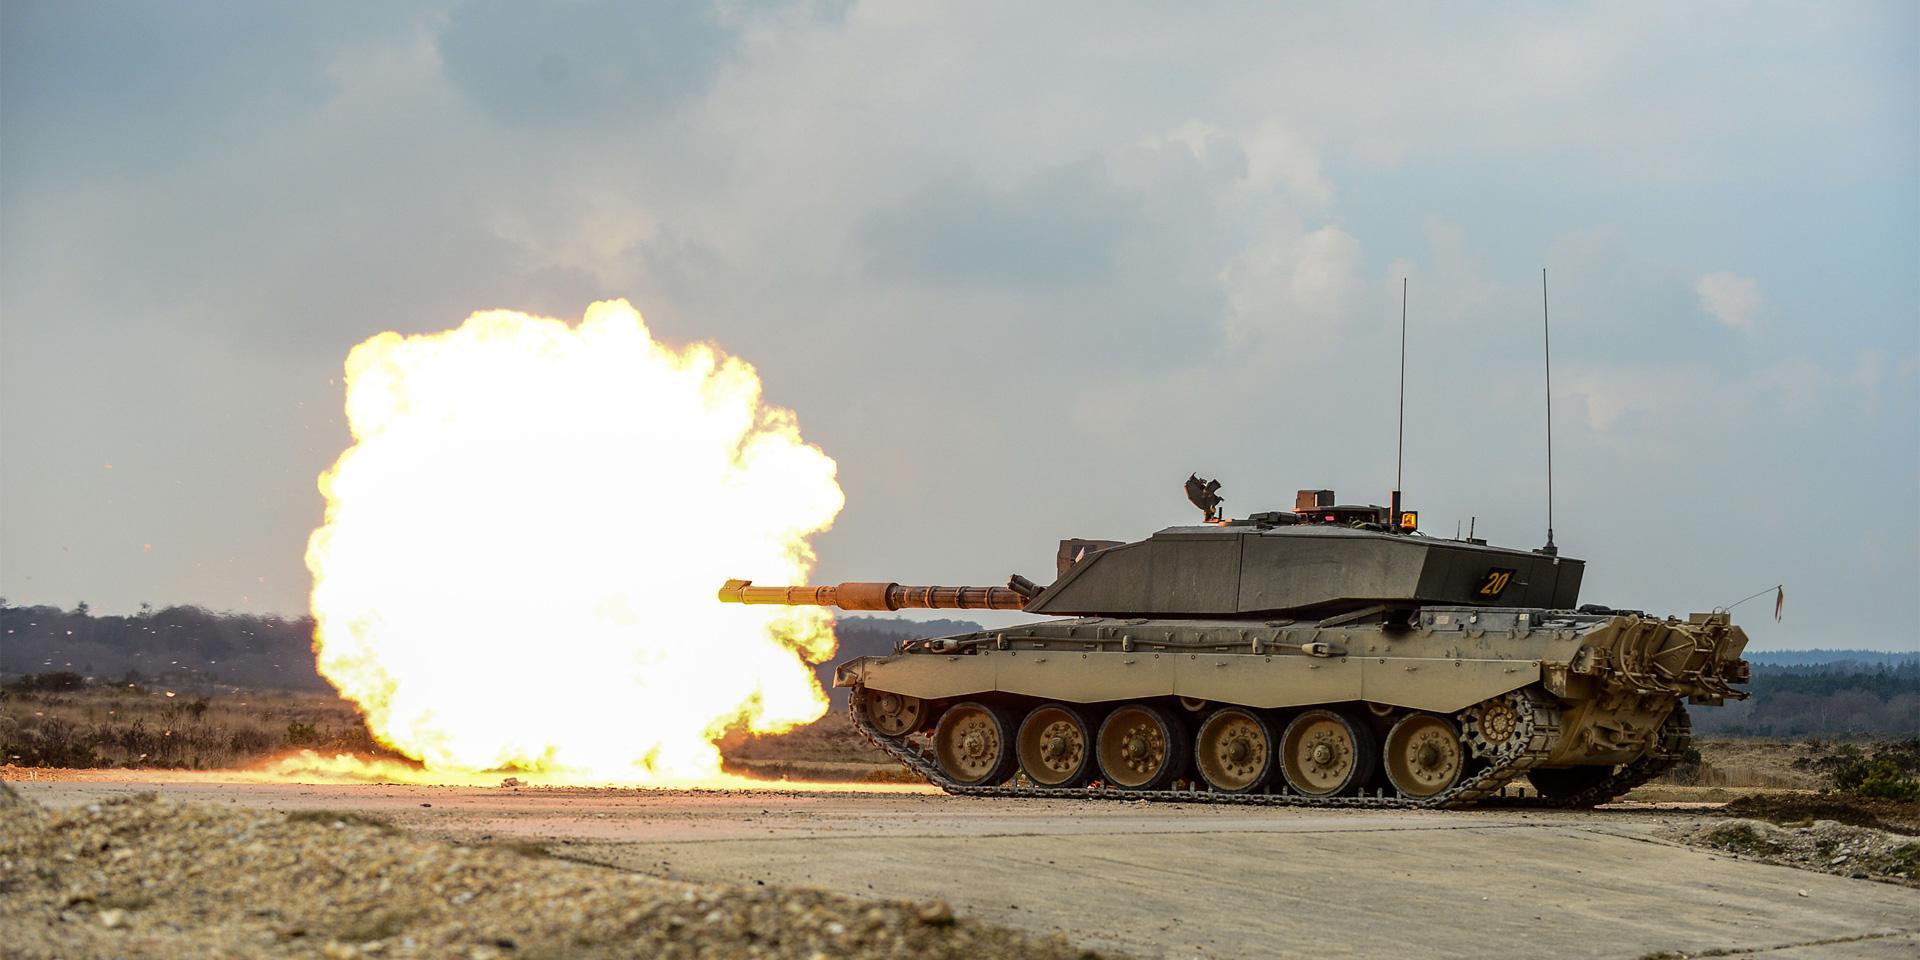 A Challenger 2 tank at Lulworth Ranges, Dorset, 2016